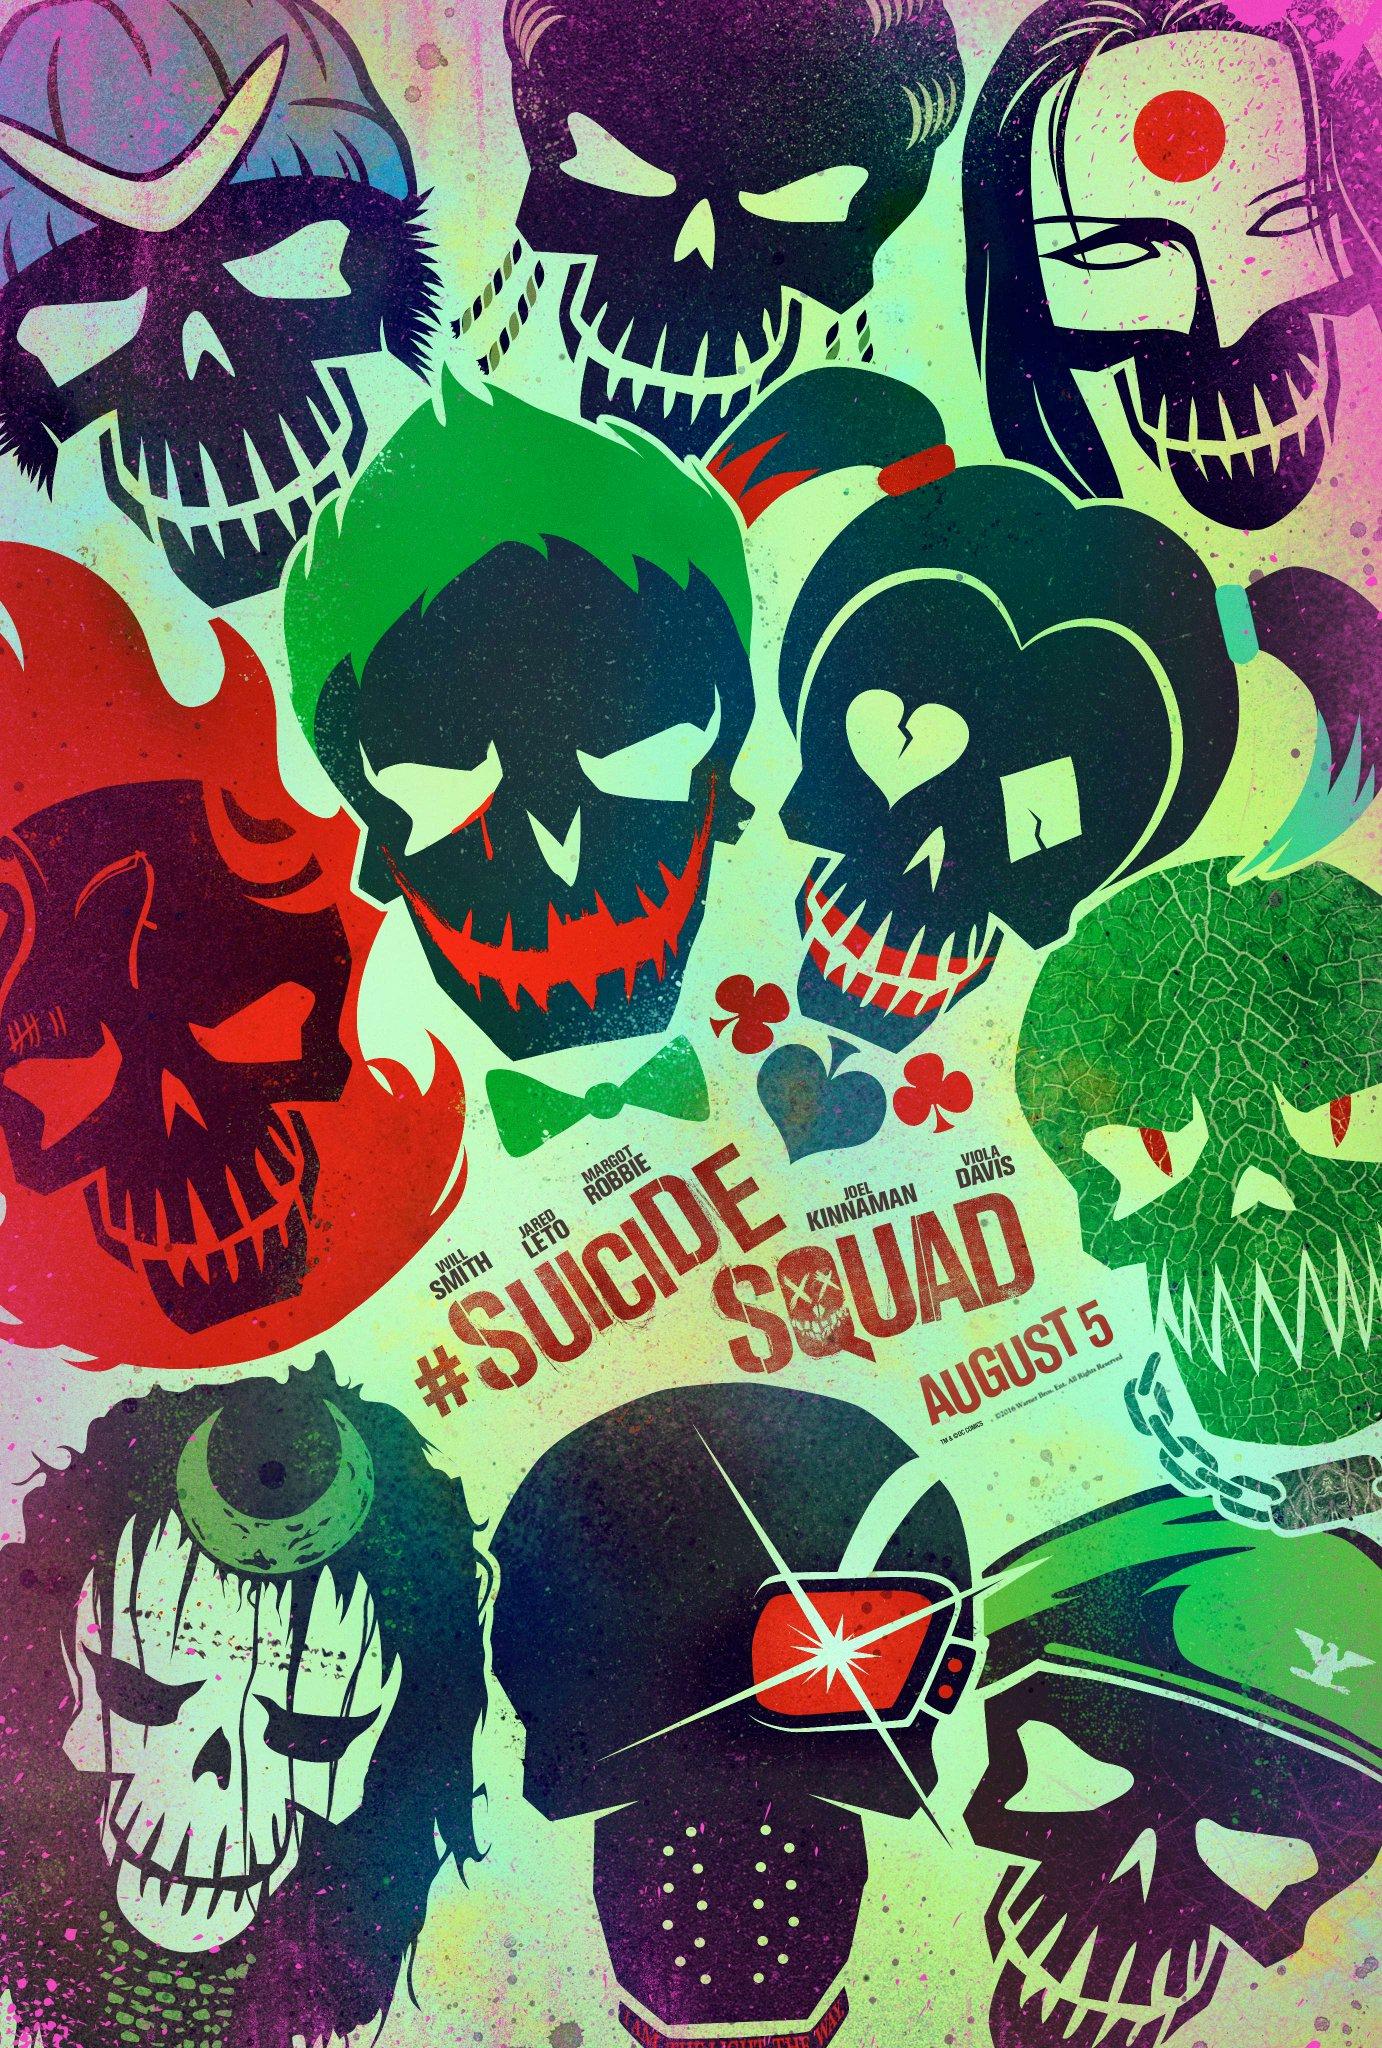 Suicide Squad (2016) - Página 5 CY8NjzeU0AAwq22